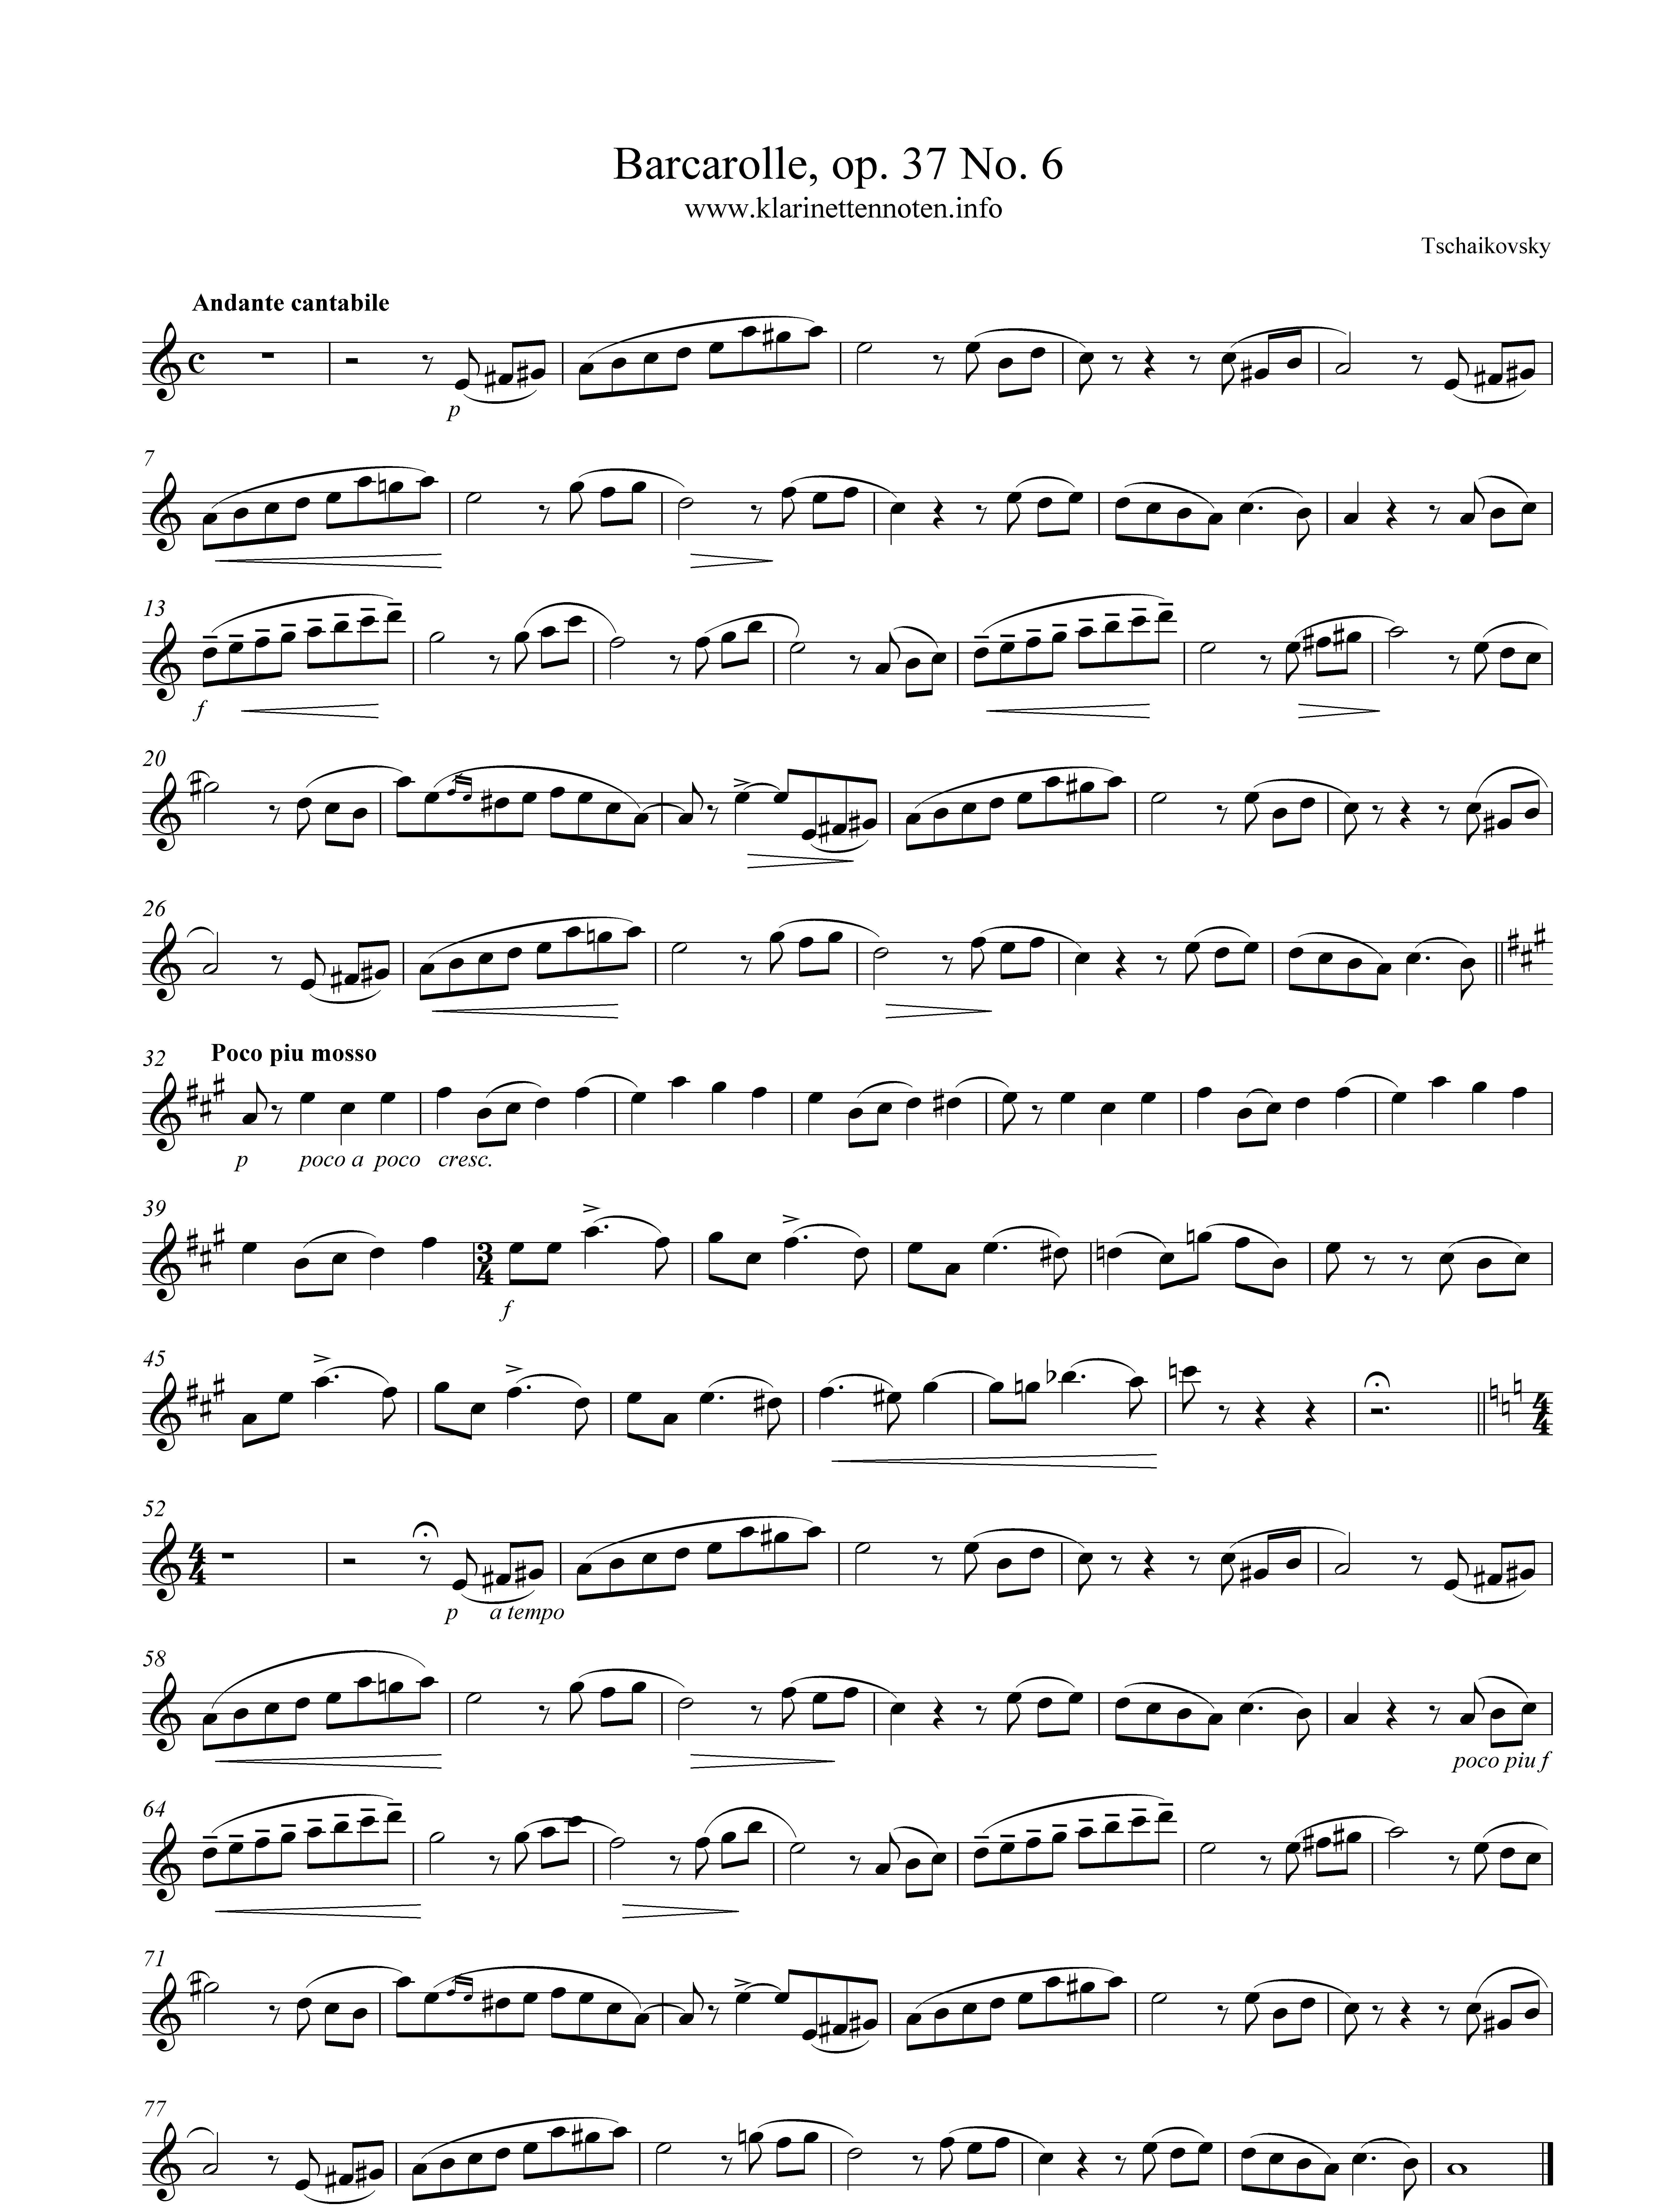 Barcarolle op.37 No.6